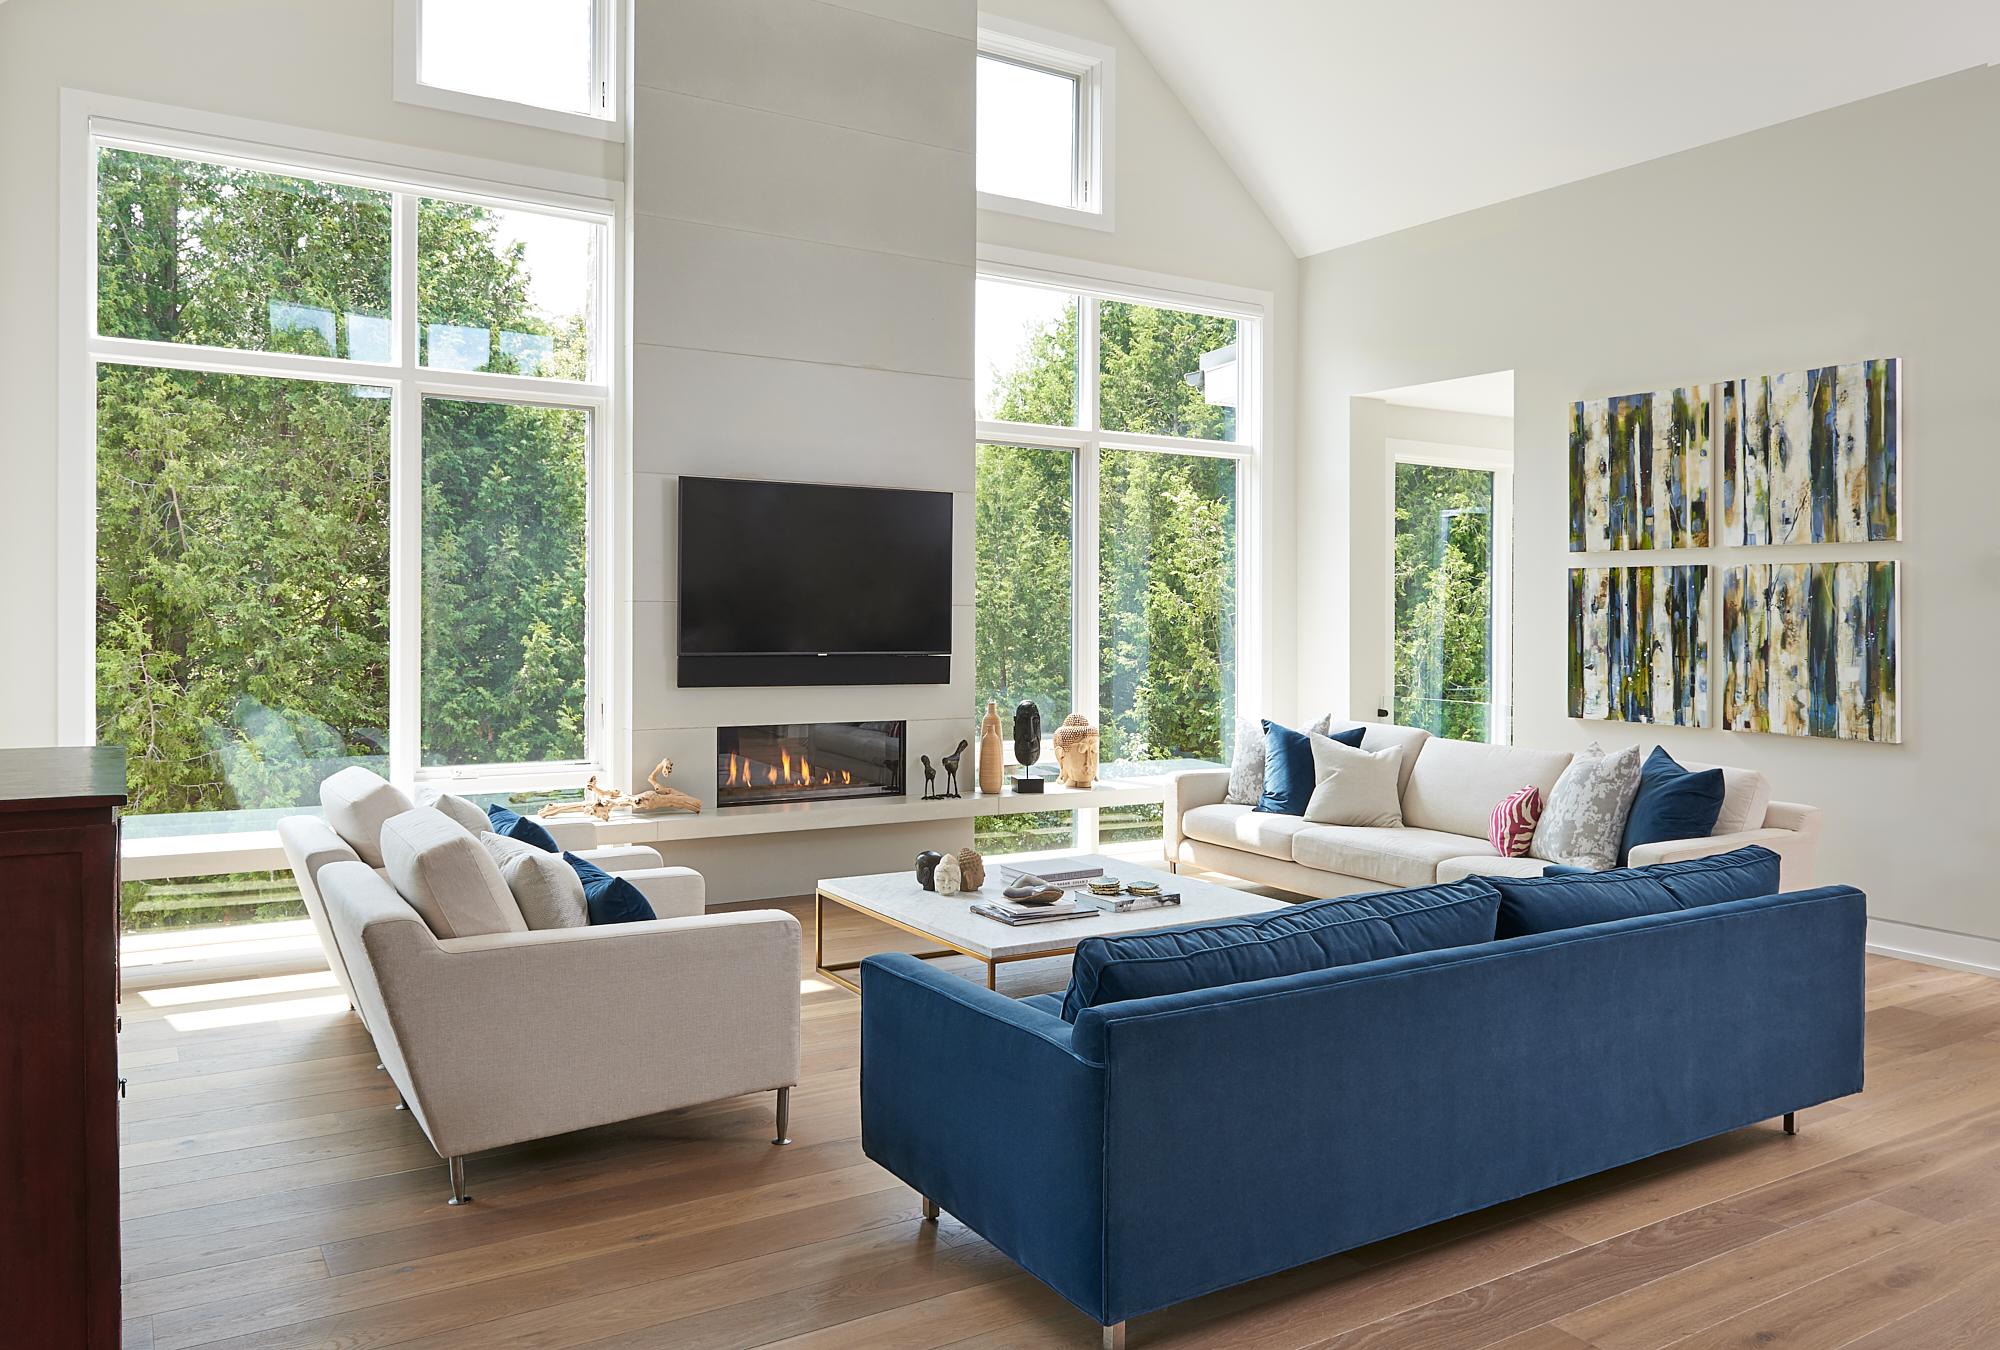 Uxbridge-open-space-design-pwr-custom-home-build.jpg